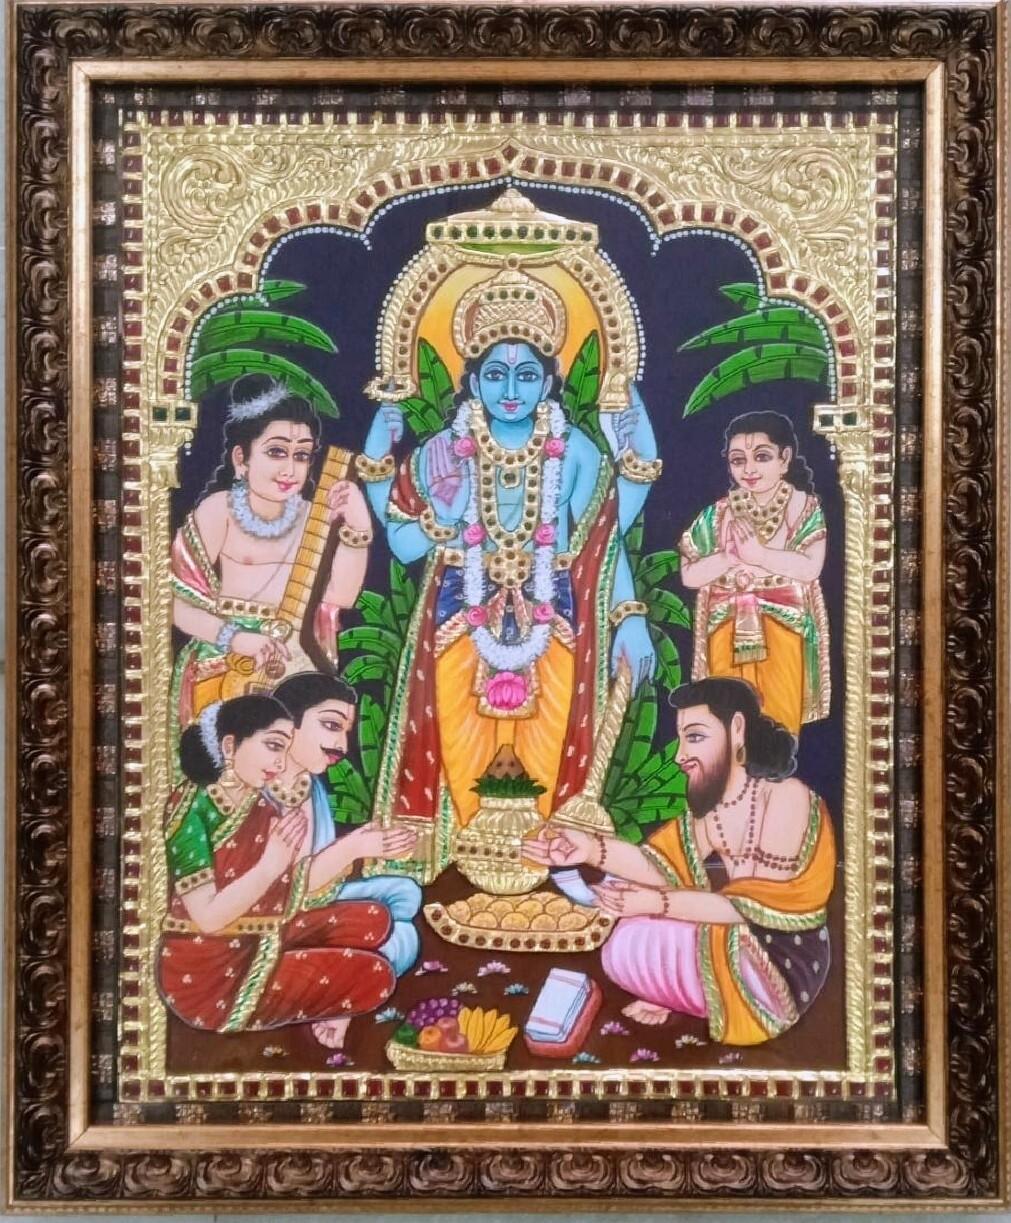 Lord Satyanarayana Swamy - Tanjore Art work Gold Foil Frame